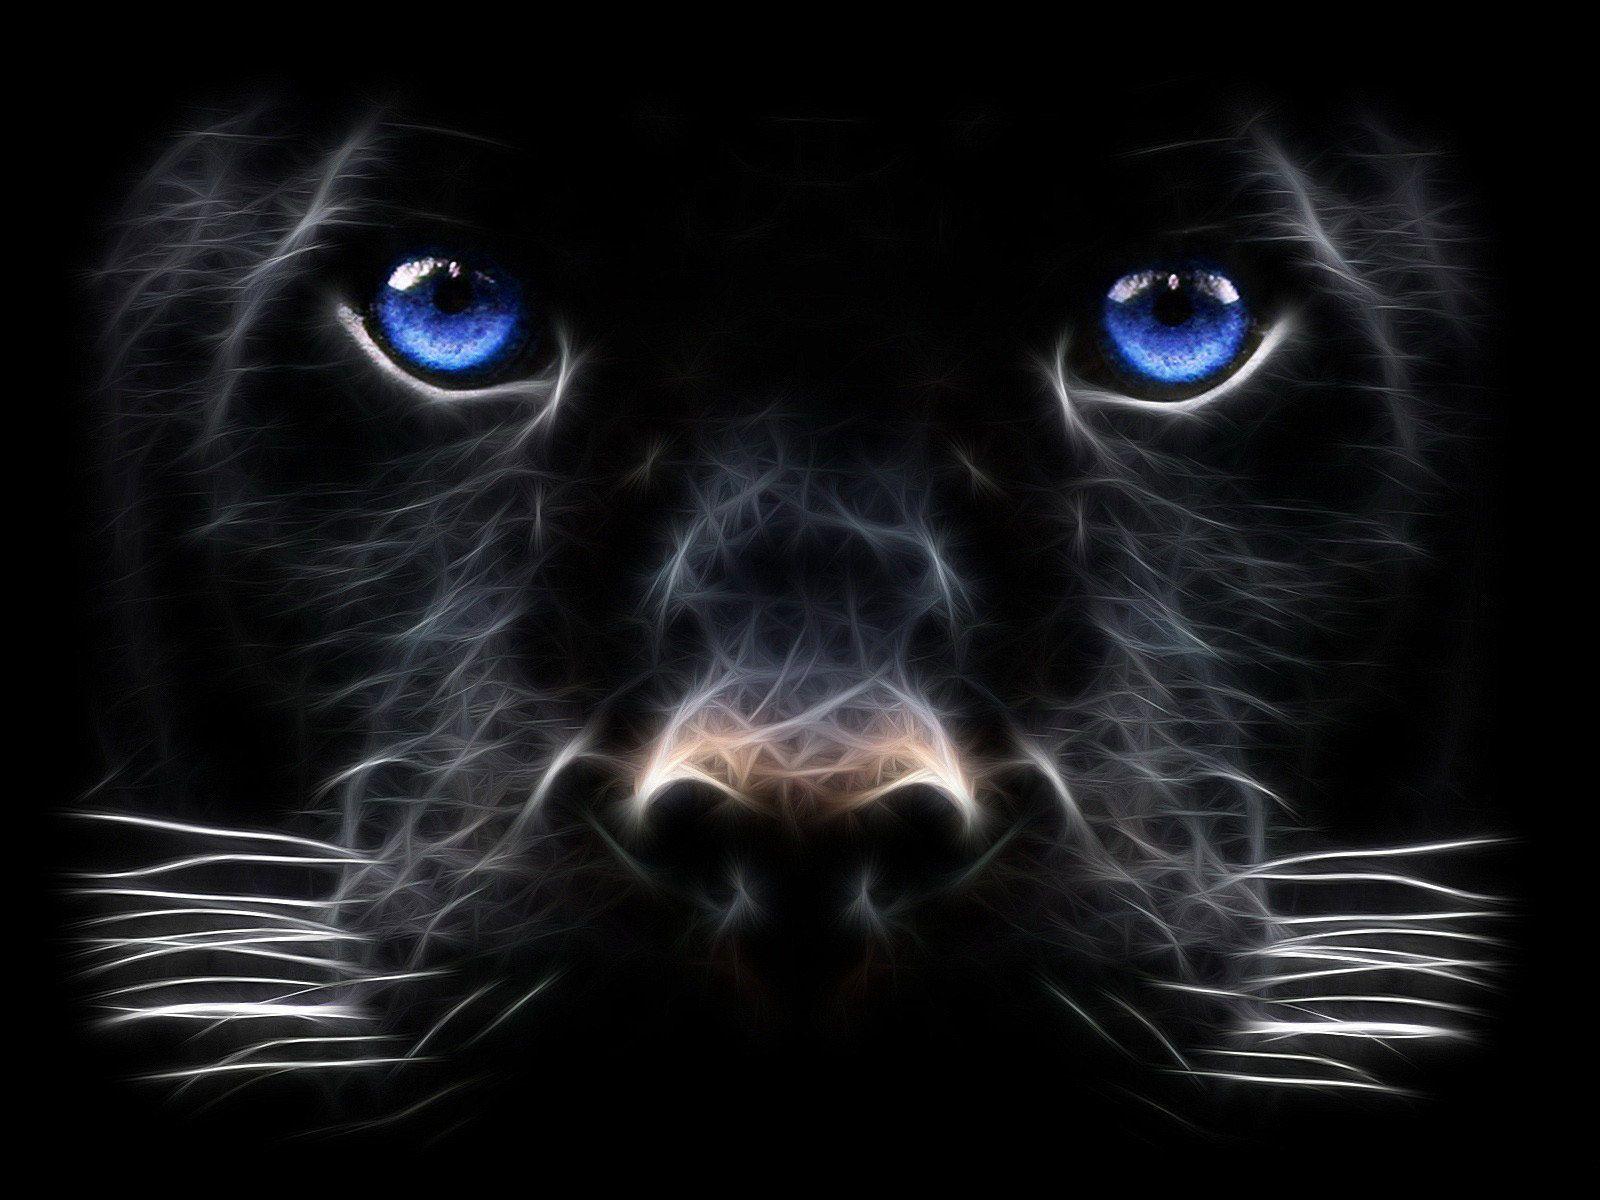 Cool 4k Black Panther Hd Wallpaper Animal Wallpaper Cat Posters